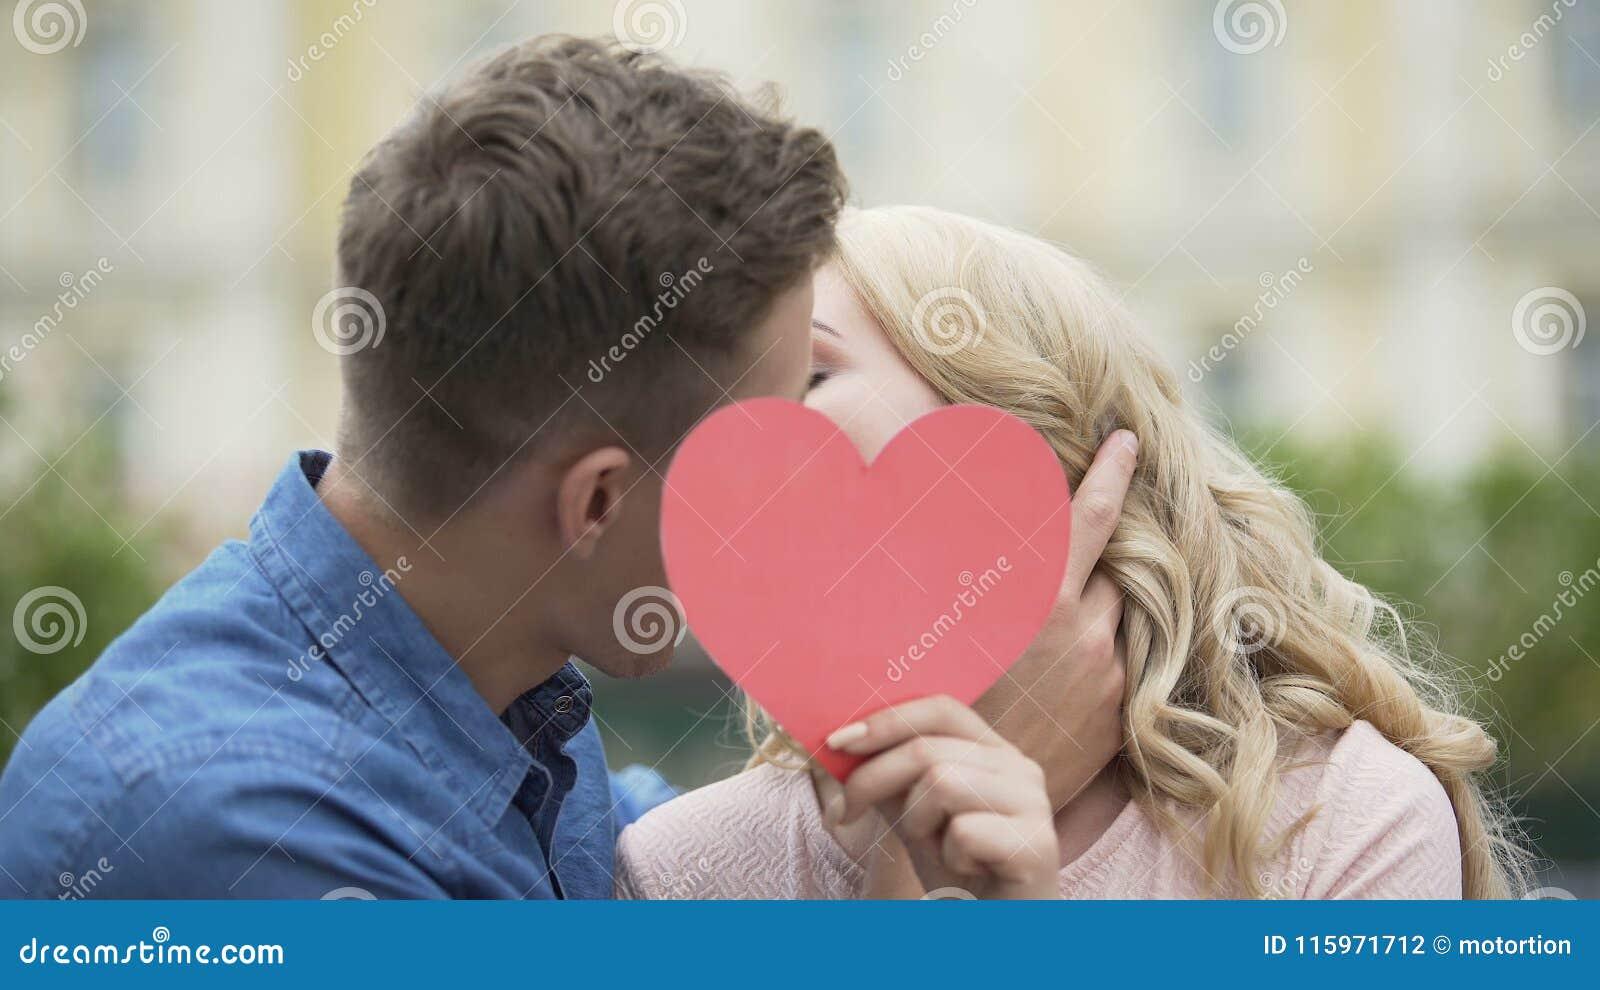 Anastasia dating photo